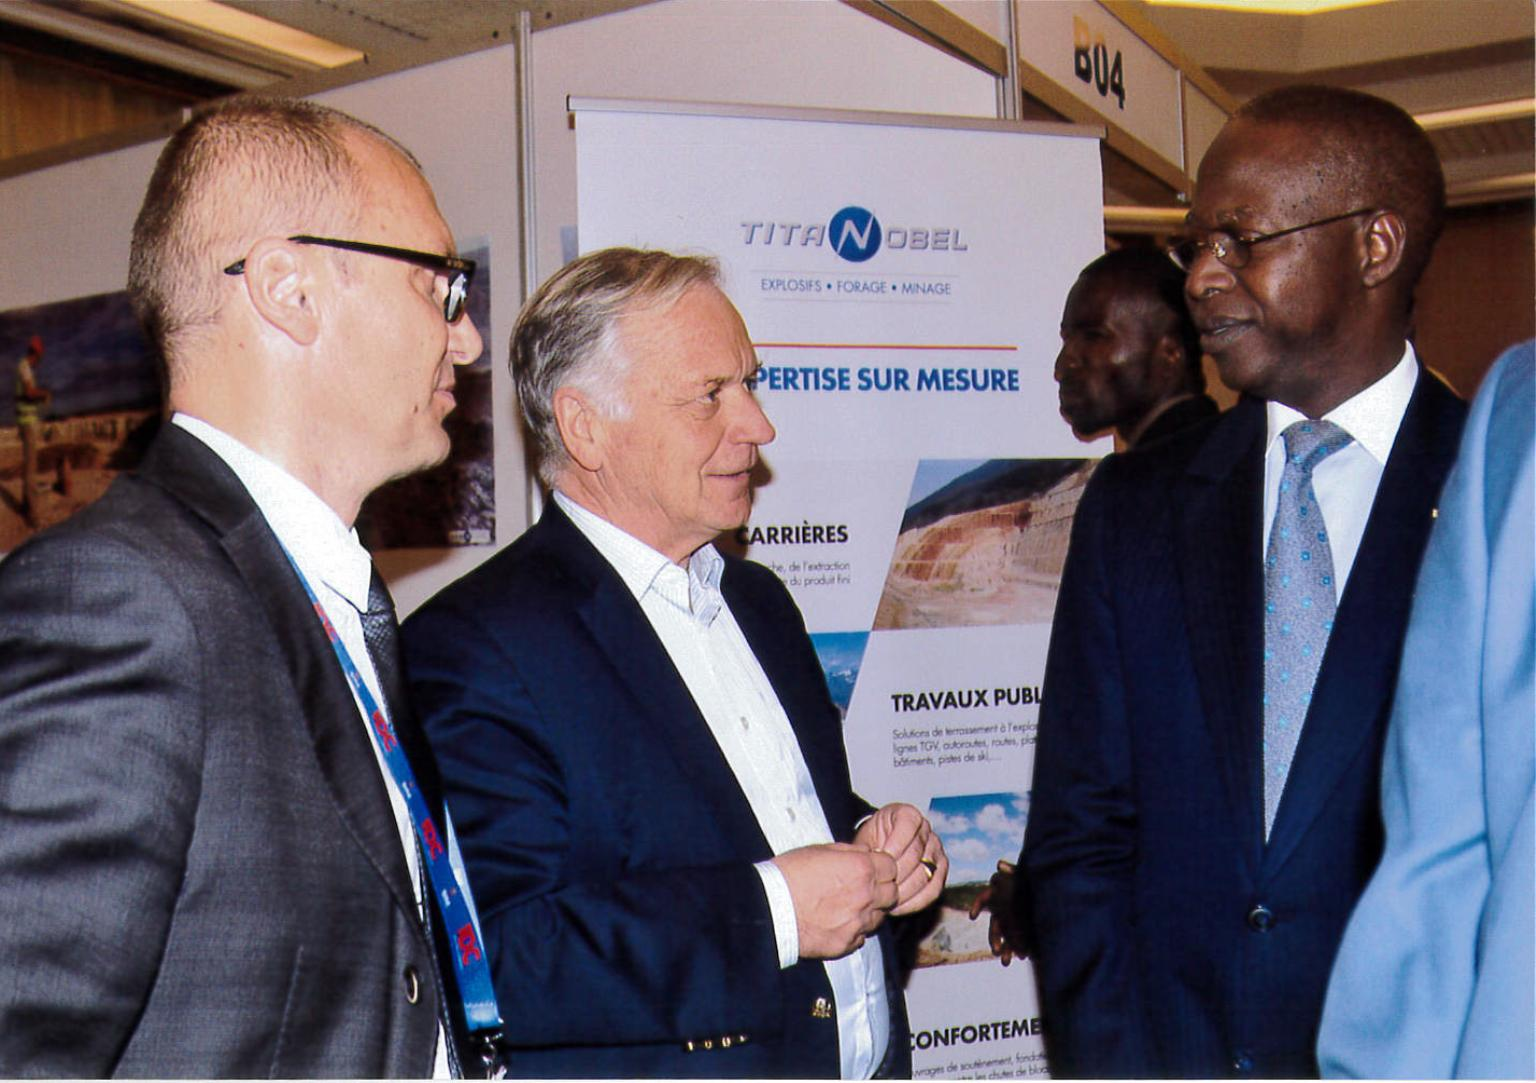 TITANOBEL was present at the SENEGAL INTERNATIONAL MINING CONFERENCE